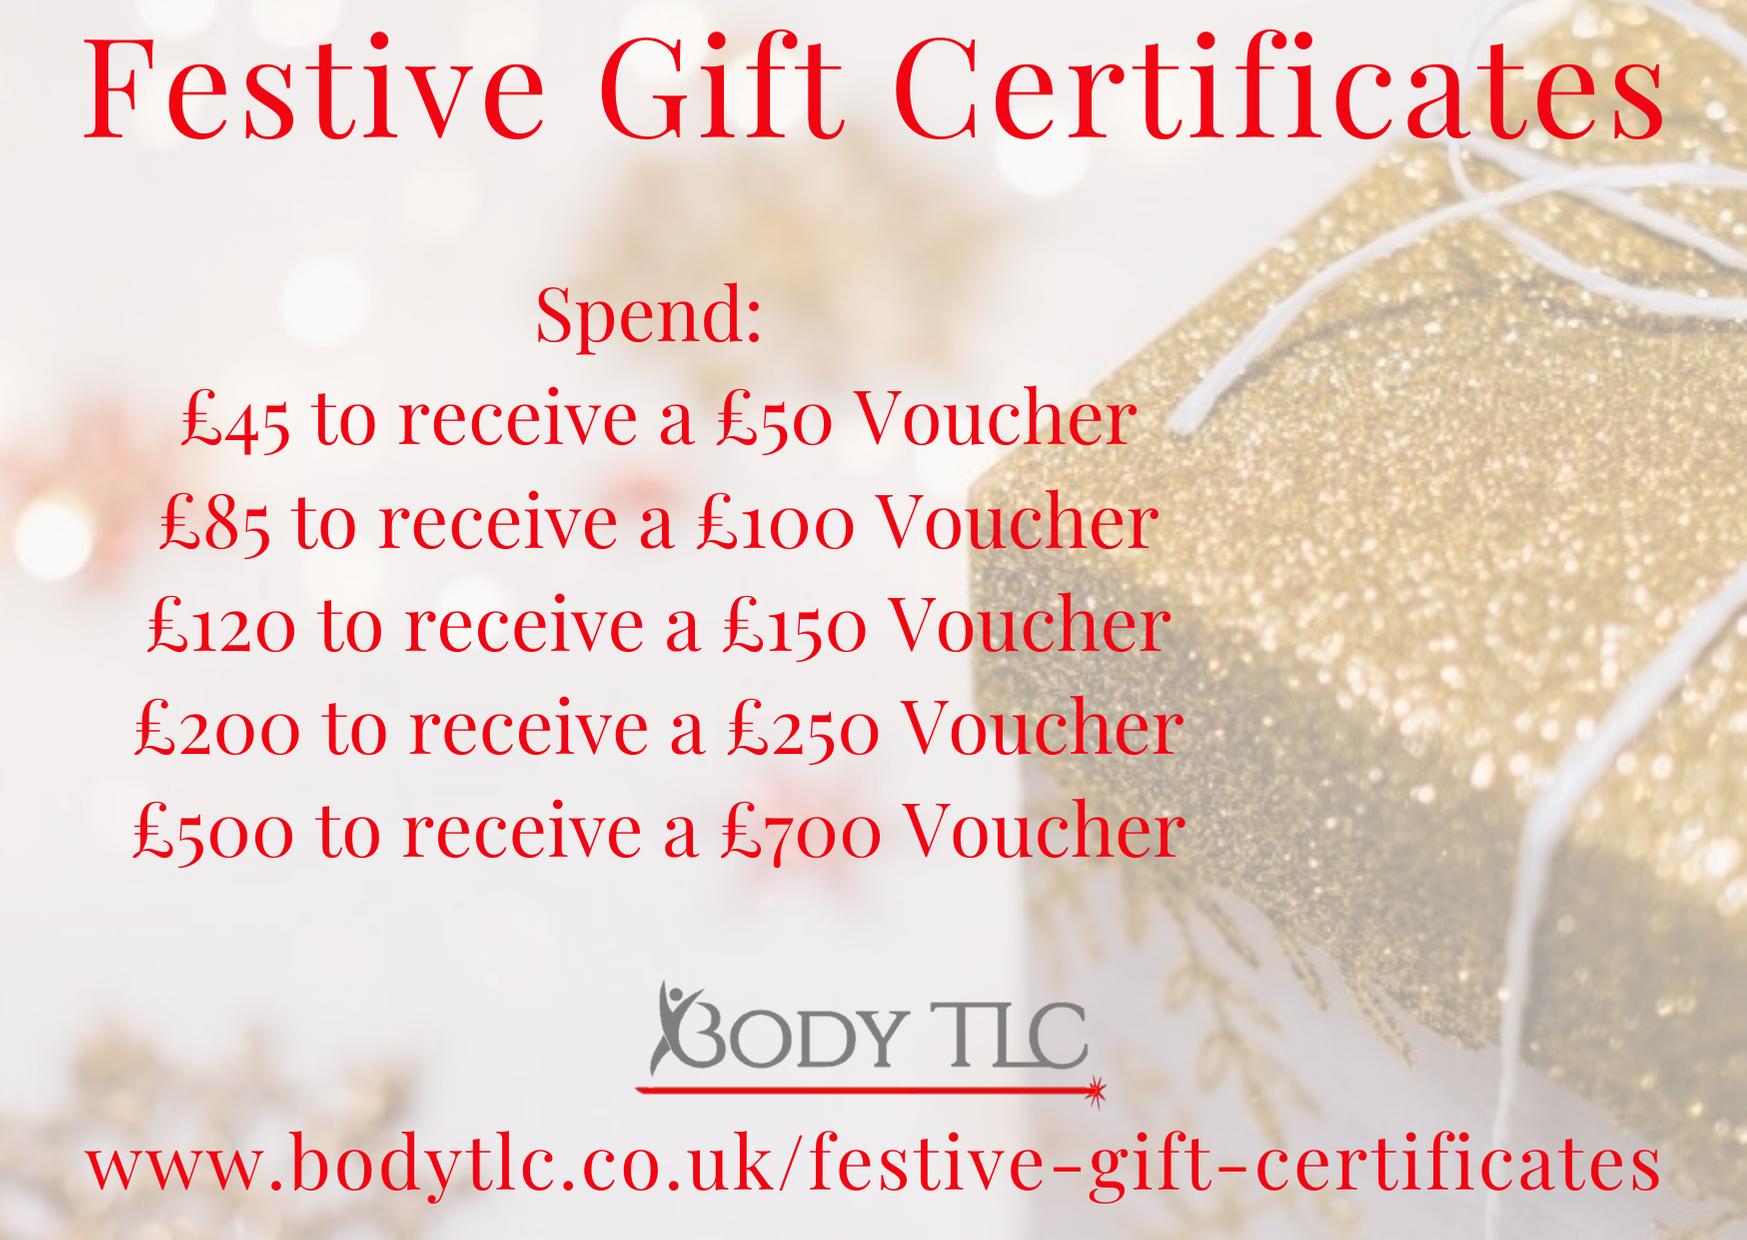 Festive Gift Certificate Amounts